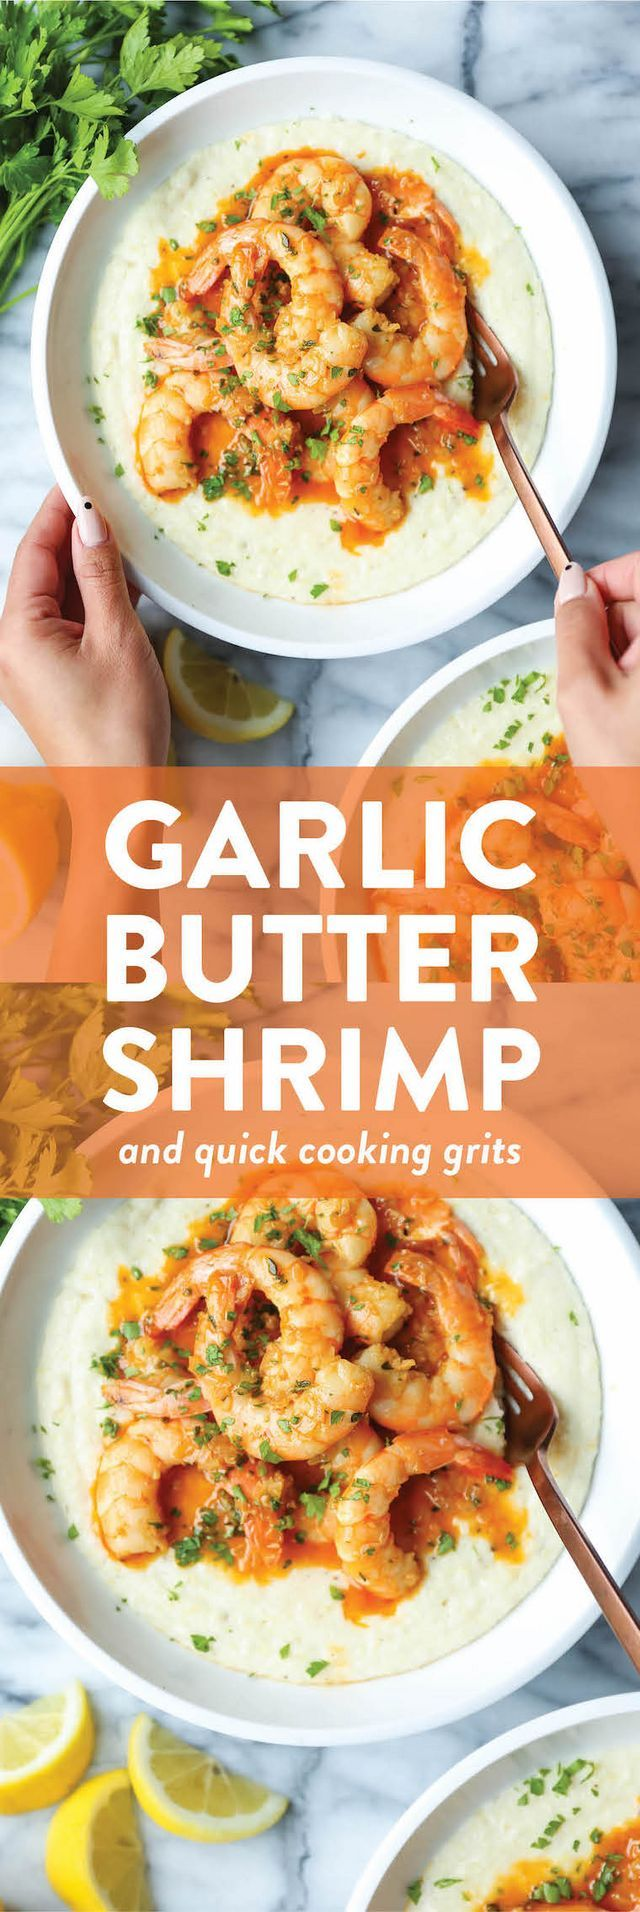 Garlic Butter Shrimp and Grits